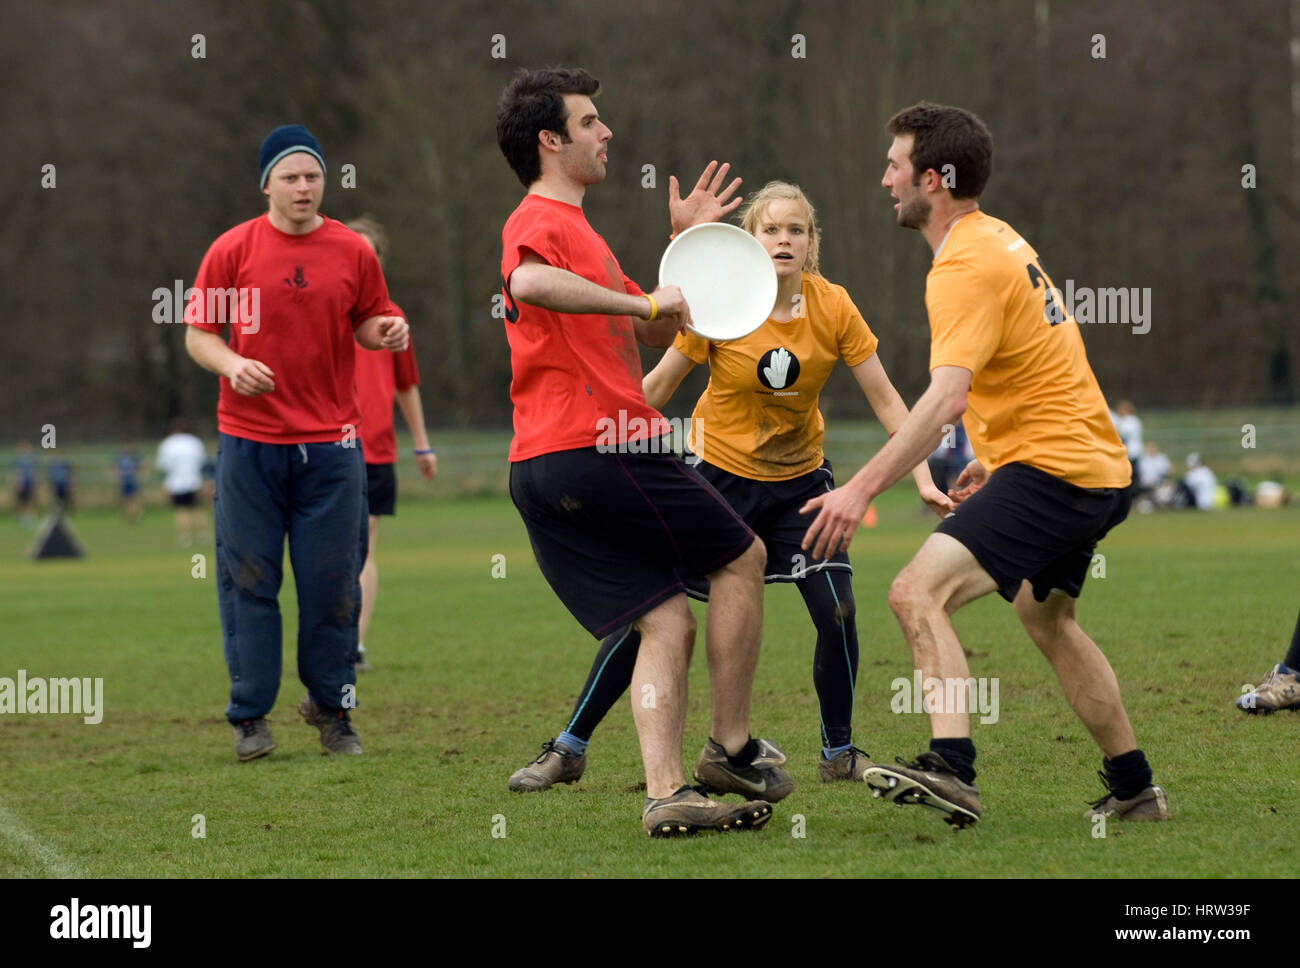 Frisbee team match - Stock Image